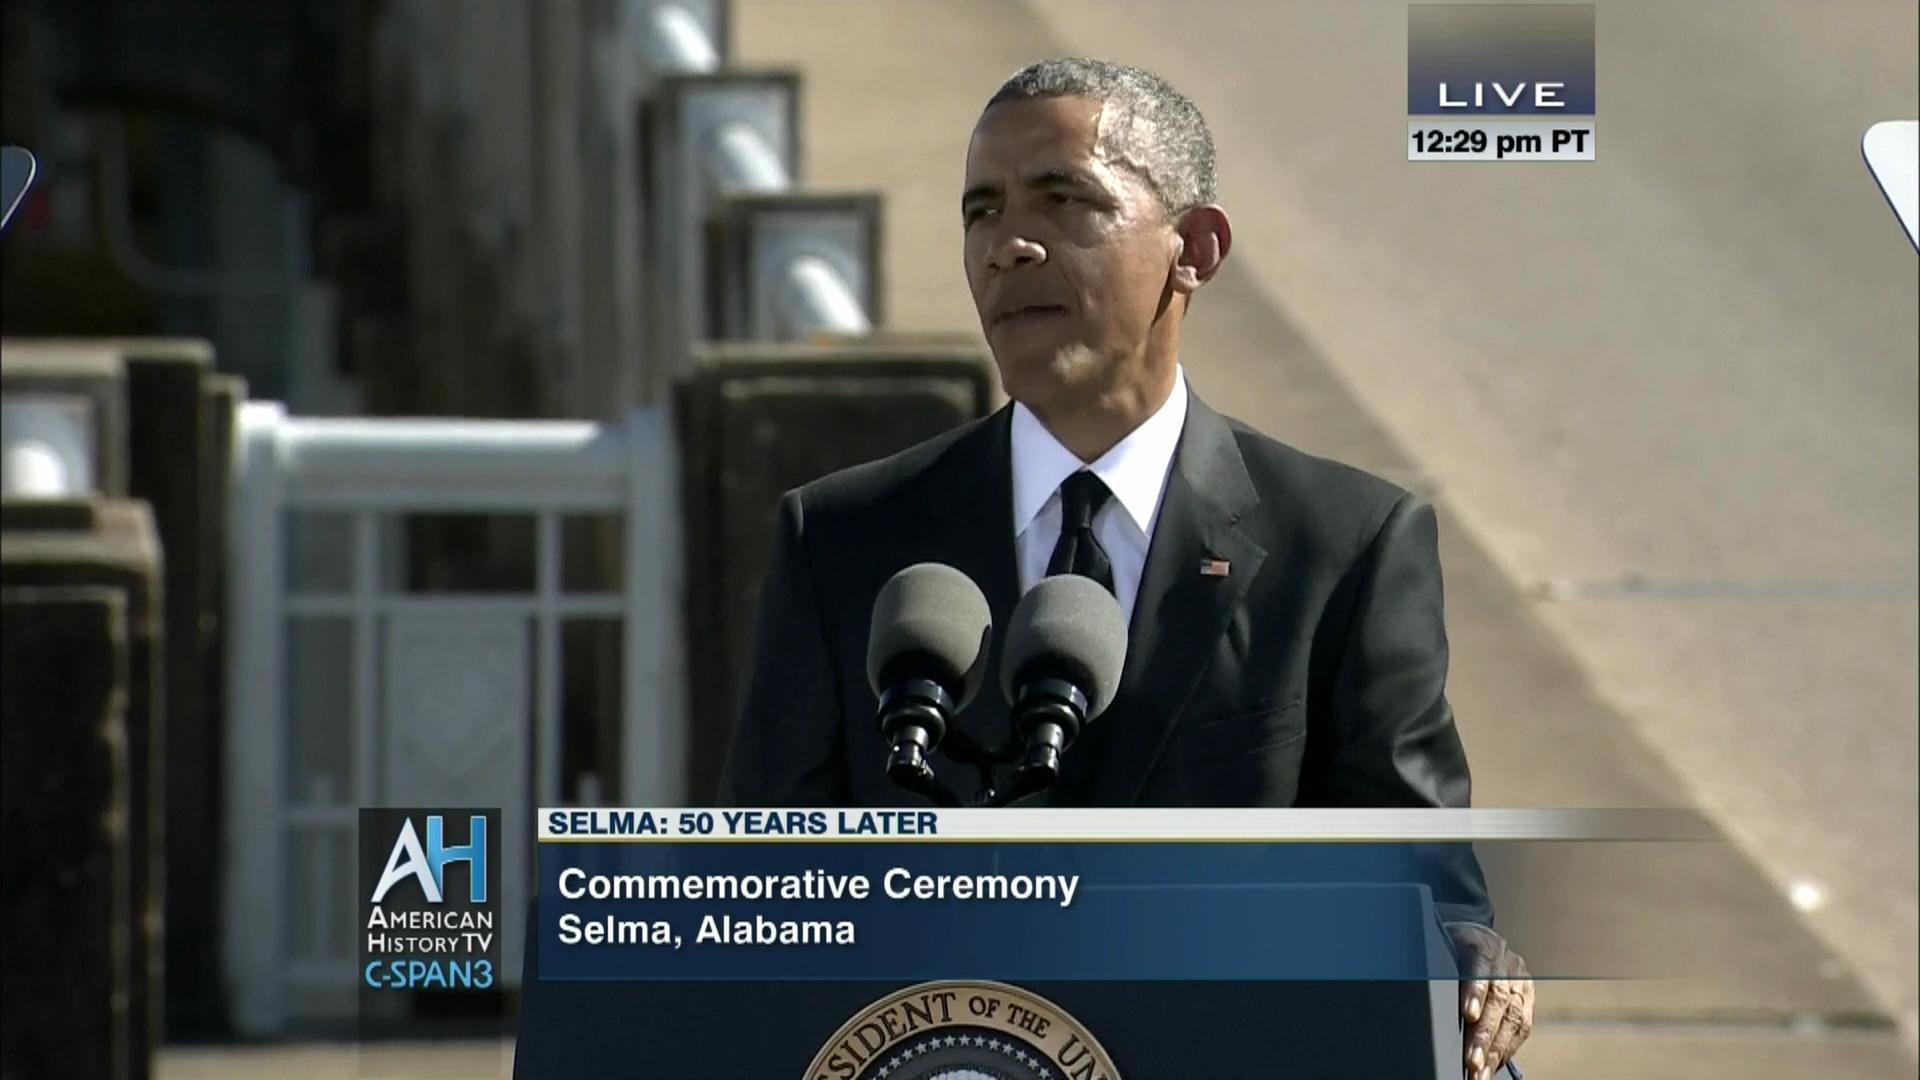 John Lewis Barack Obama at Selma